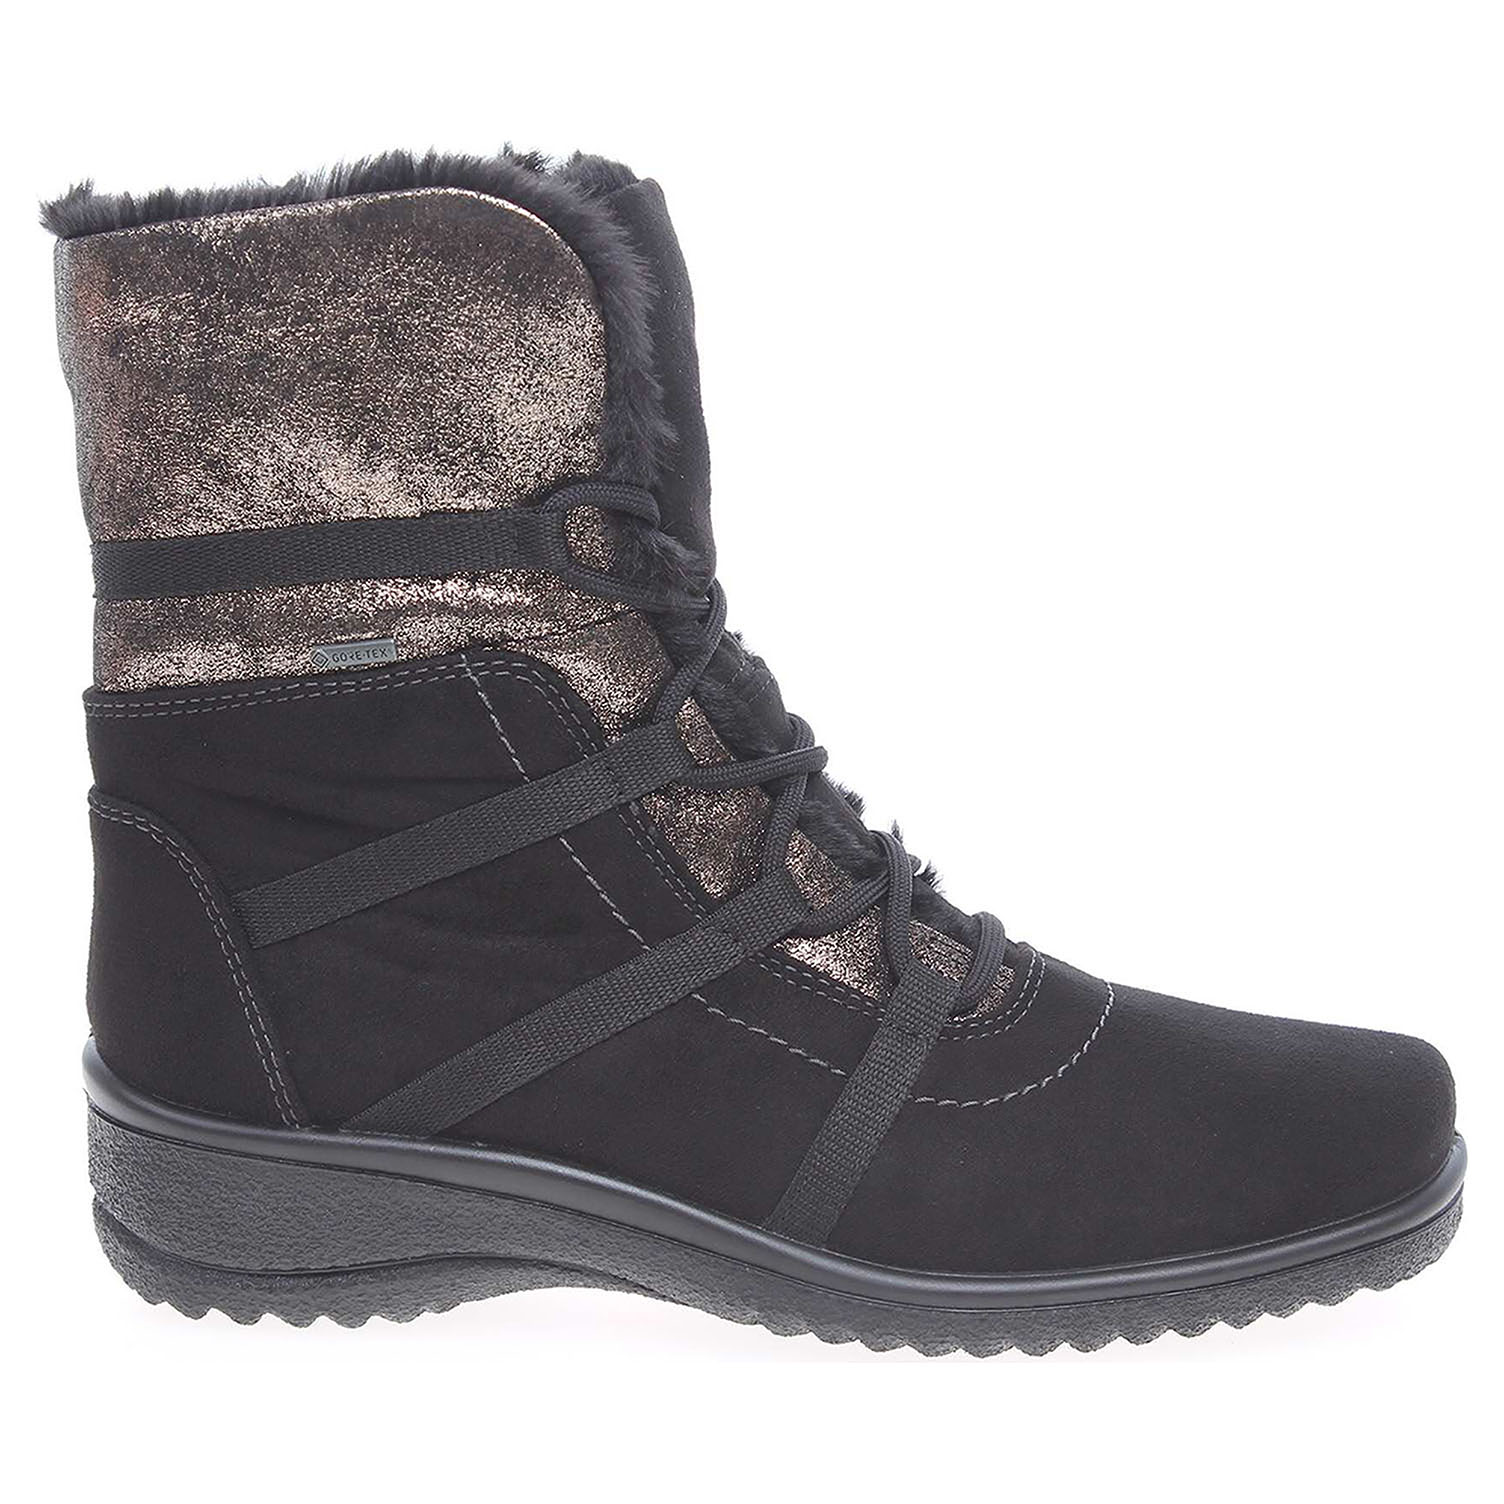 Ara dámská obuv 48523-95 černá 12-48523-95 37